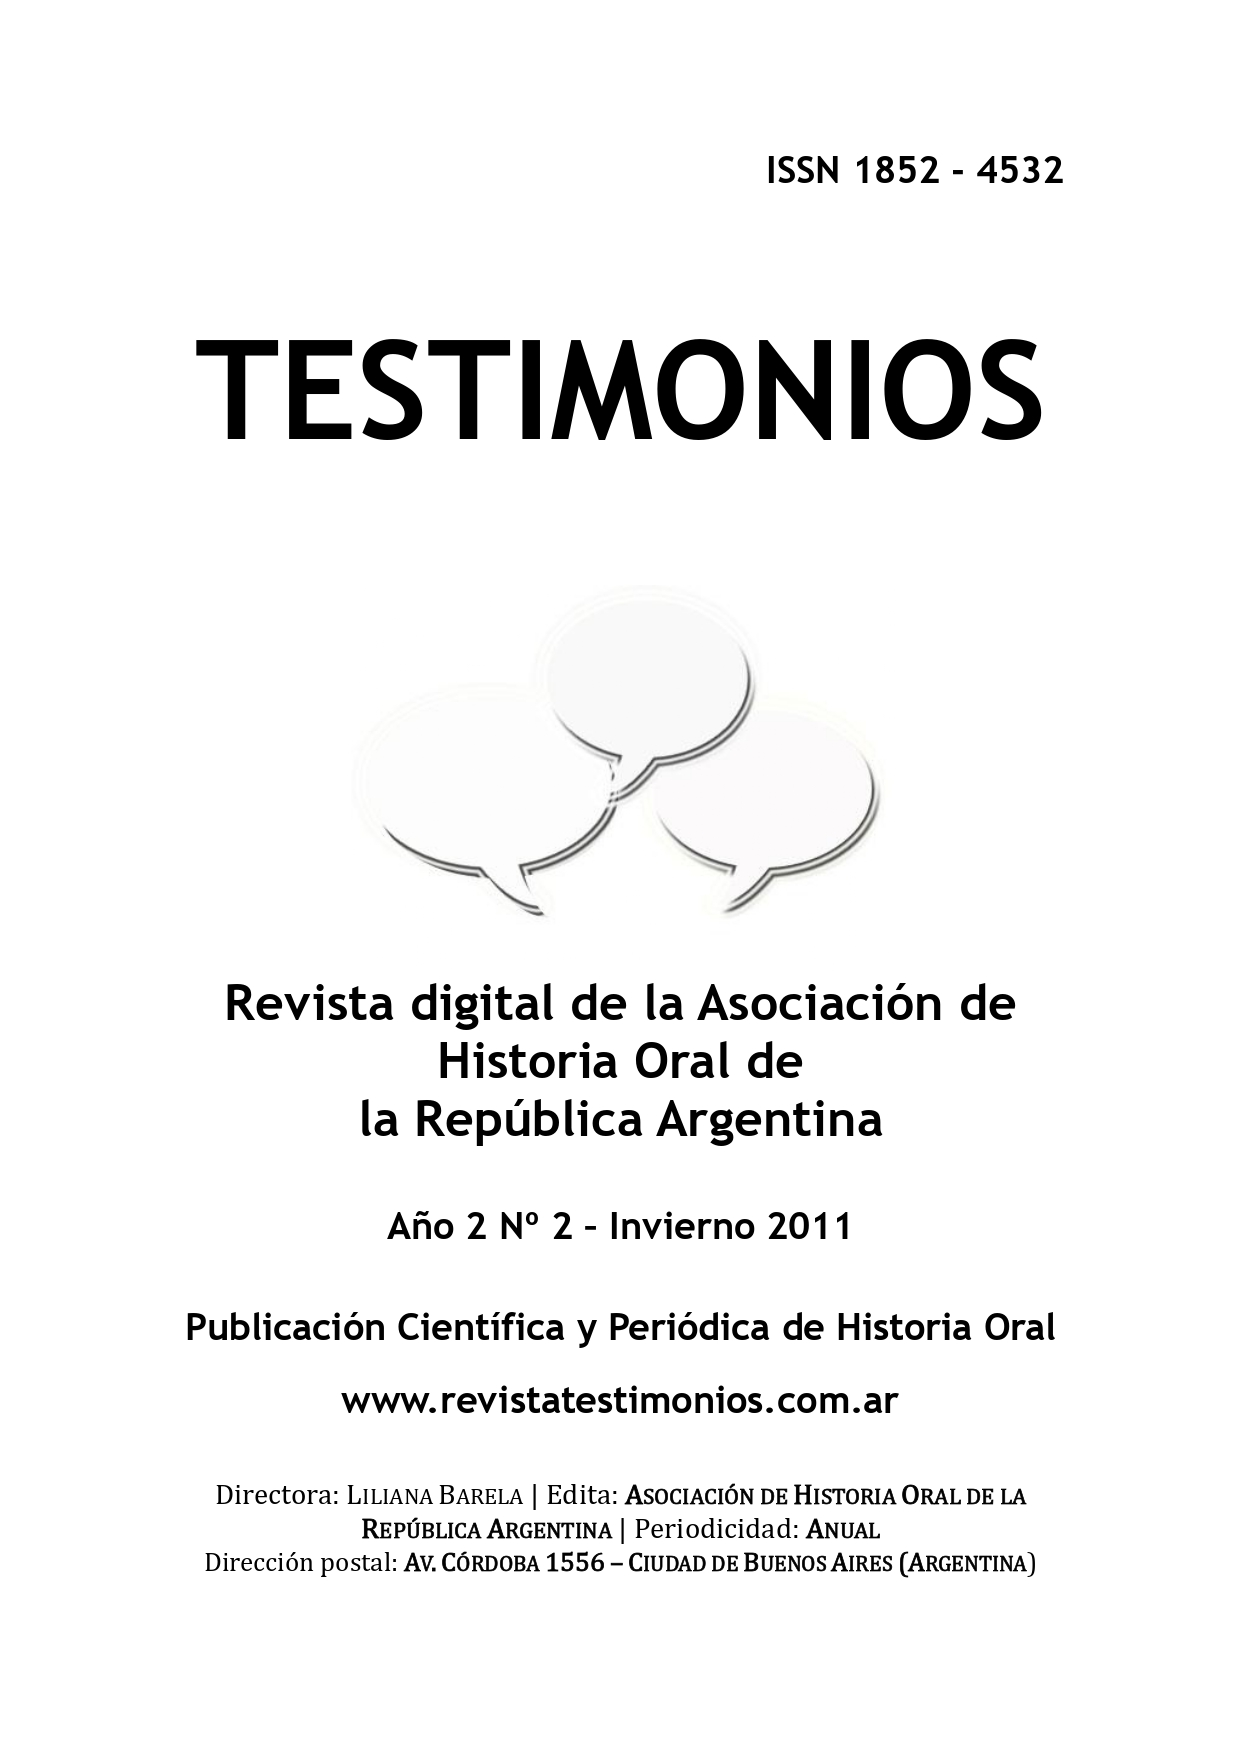 Ver Núm. 2 (2011): TESTIMONIOS Nº2